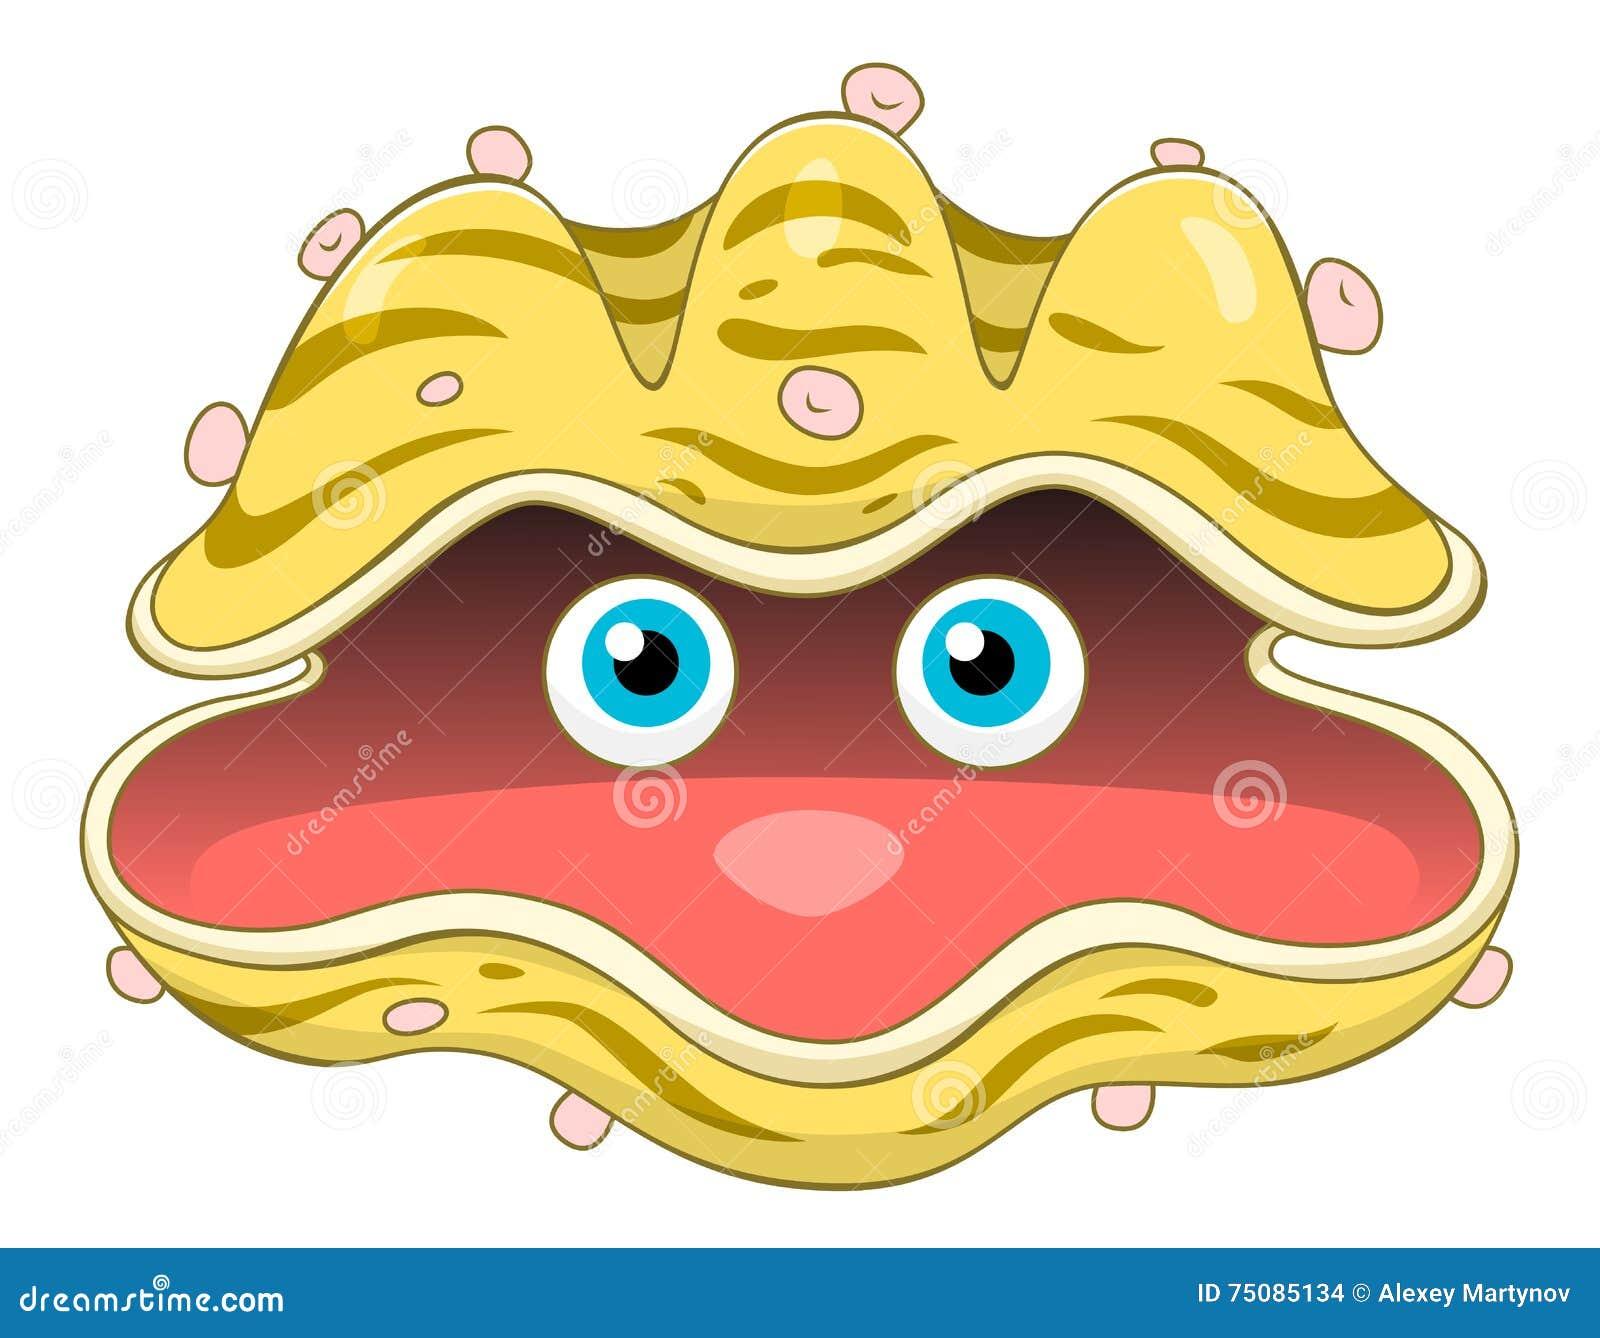 Cartoon seashell stock vector. Image of underwater, funny ...